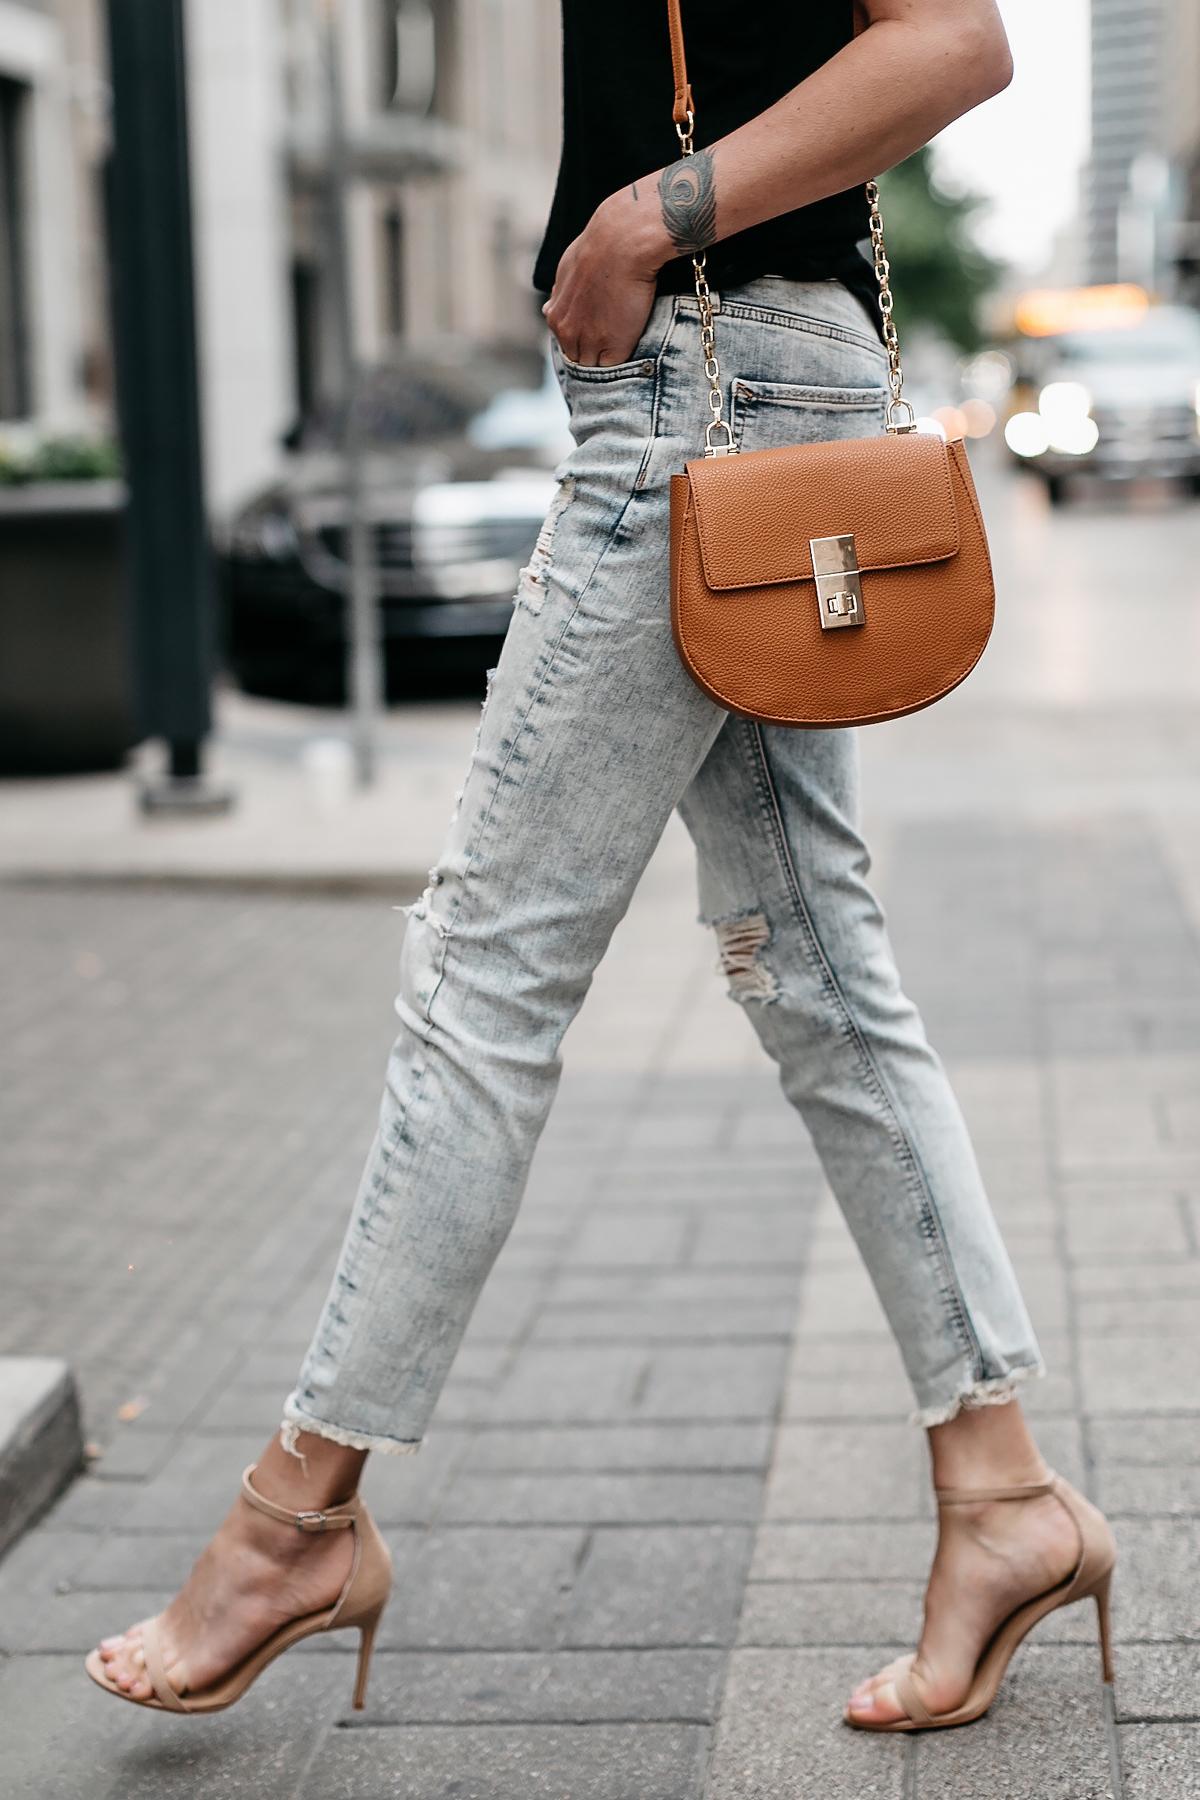 Woman Wearing Express Ripped Jeans Tan Ankle Strap Heeled Sandals Tan Handbag Fashion Jackson Dallas Blogger Fashion Blogger Street Style